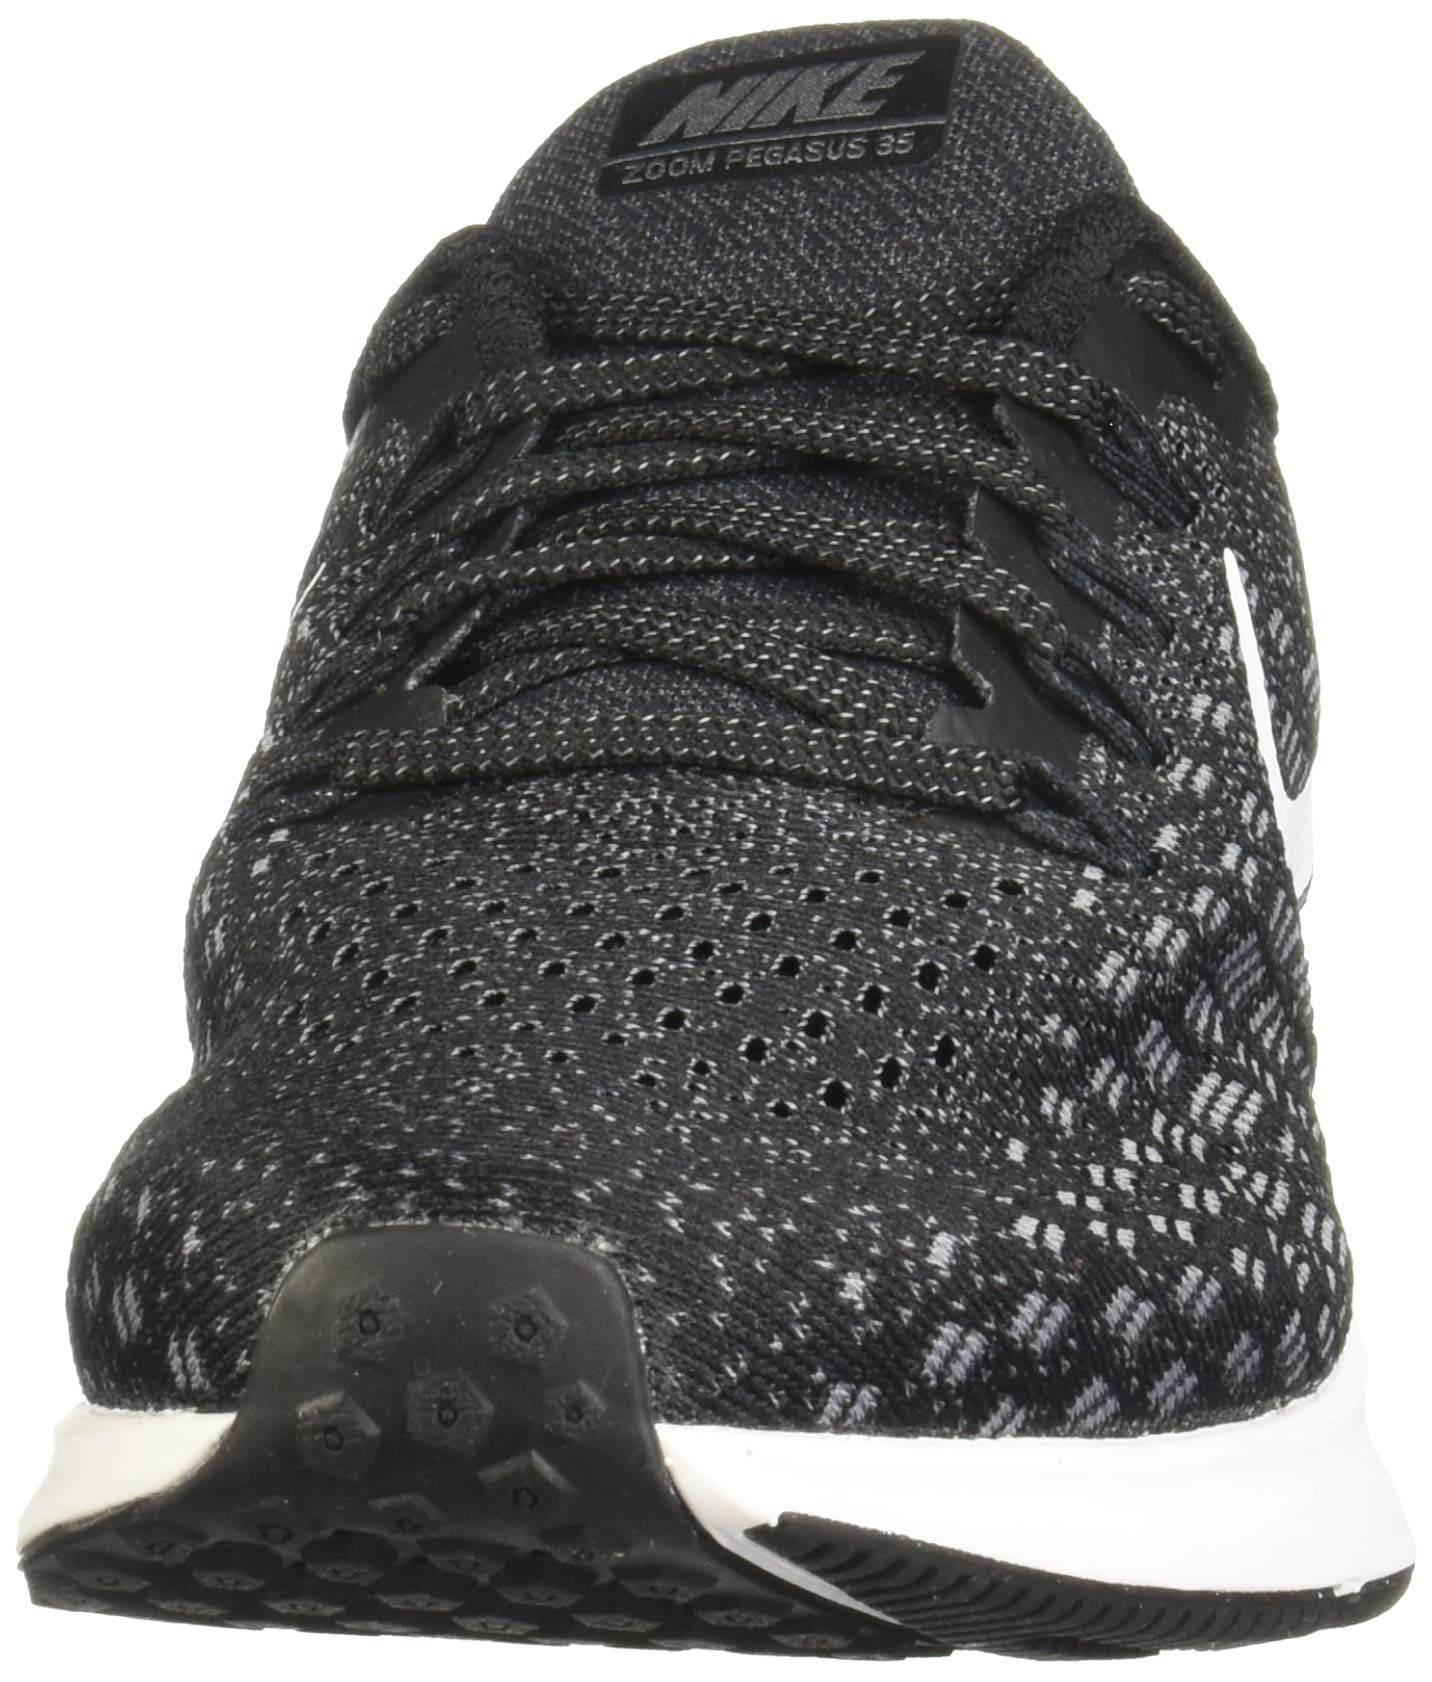 Nike Shox Current Gs Women's Running Shoe (5, Black/Black) by Nike (Image #4)